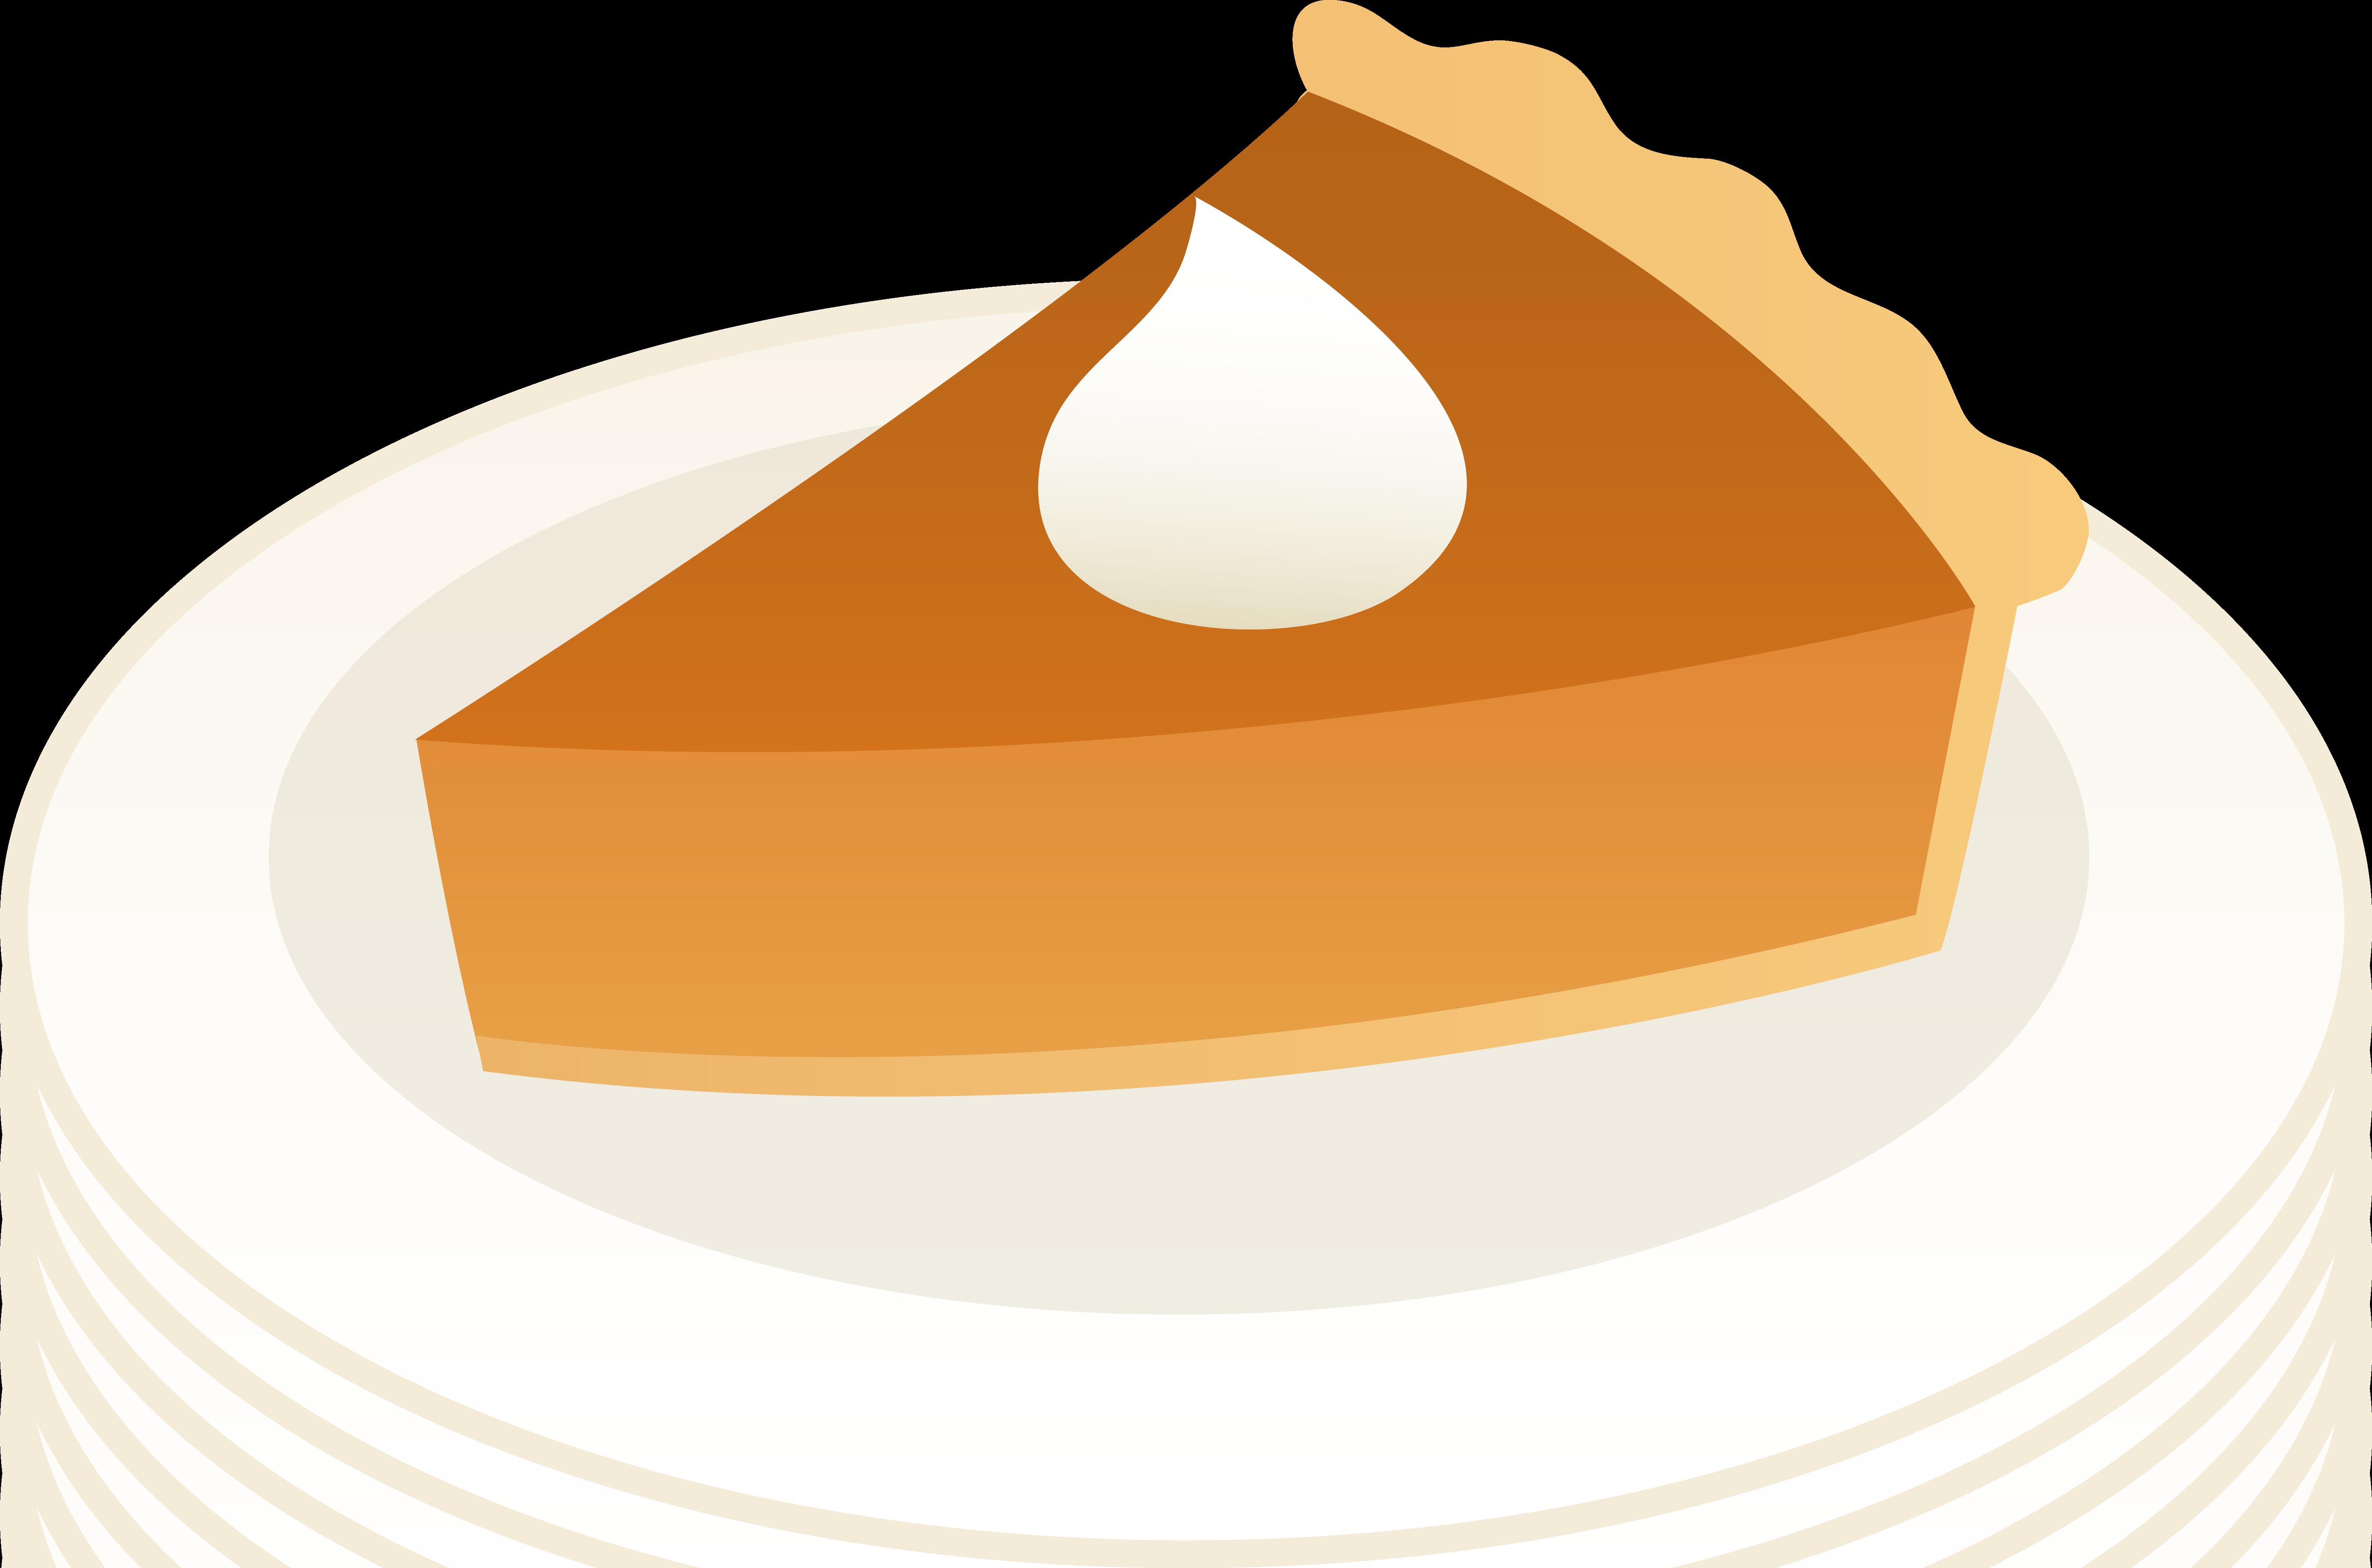 Slice of Pumpkin Pie on Plate.